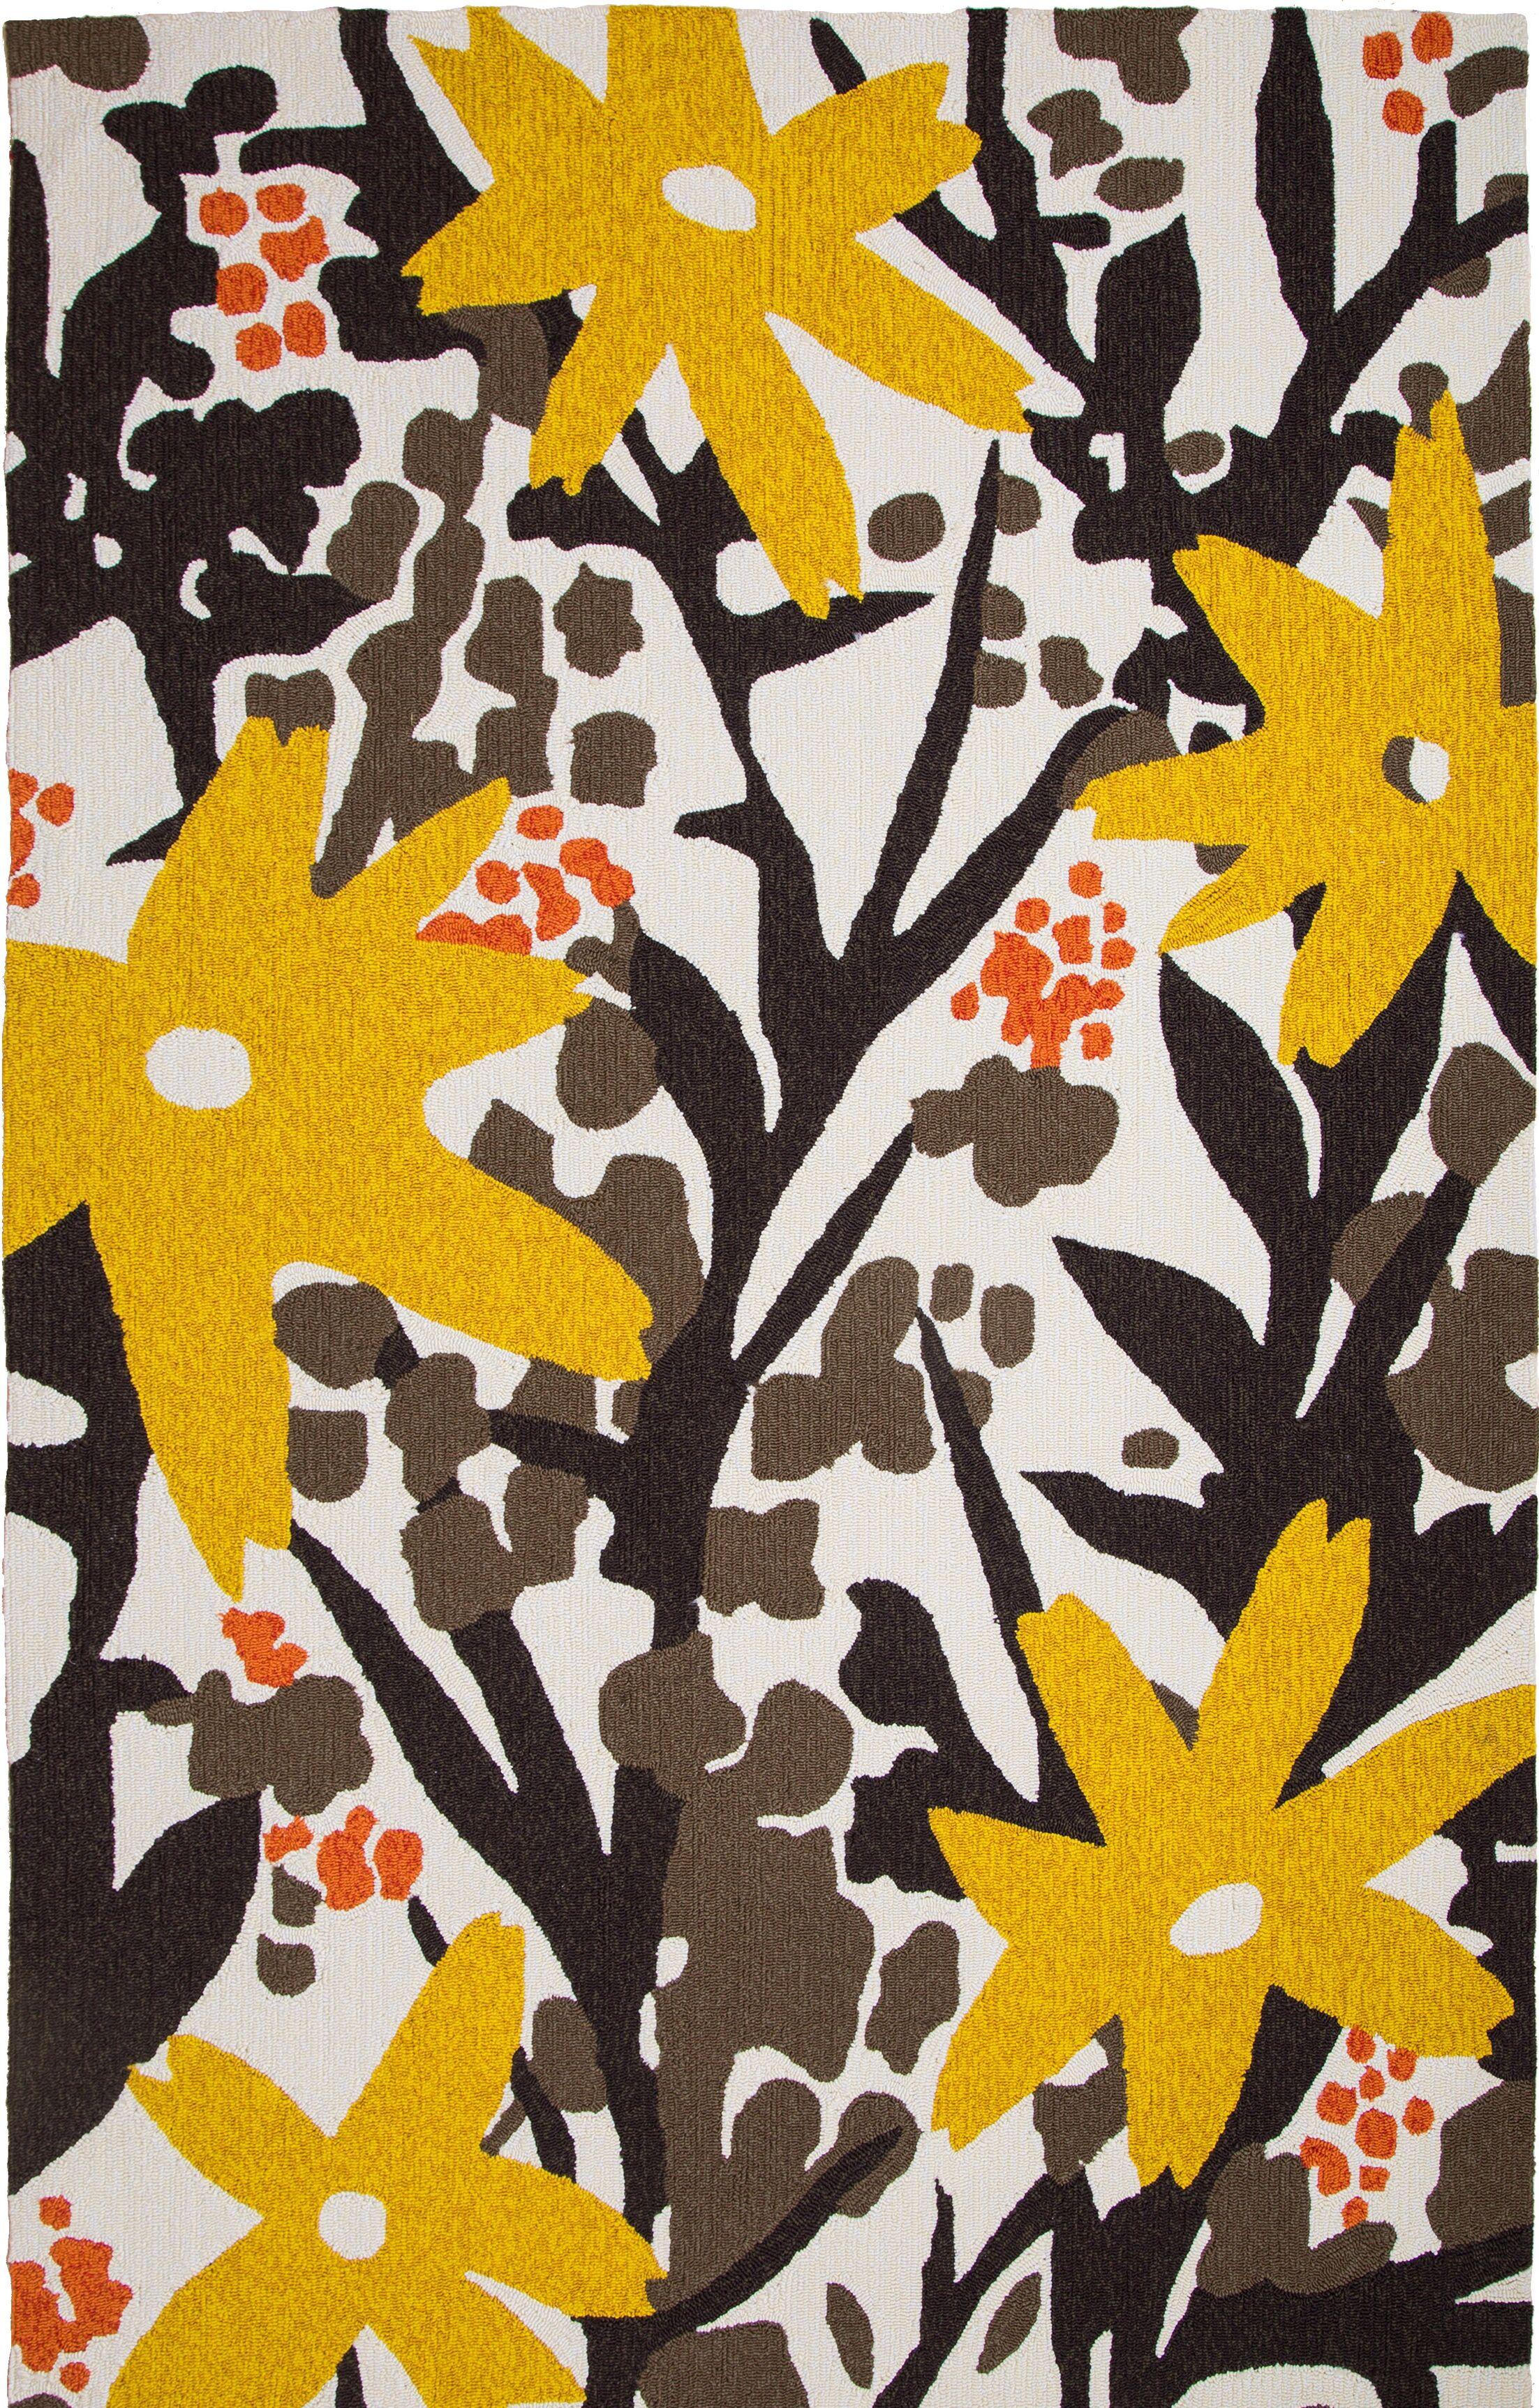 Bloom Hand-Tufted Brown/Gold Indoor/Outdoor Area Rug Rug Size: 8' x 10'